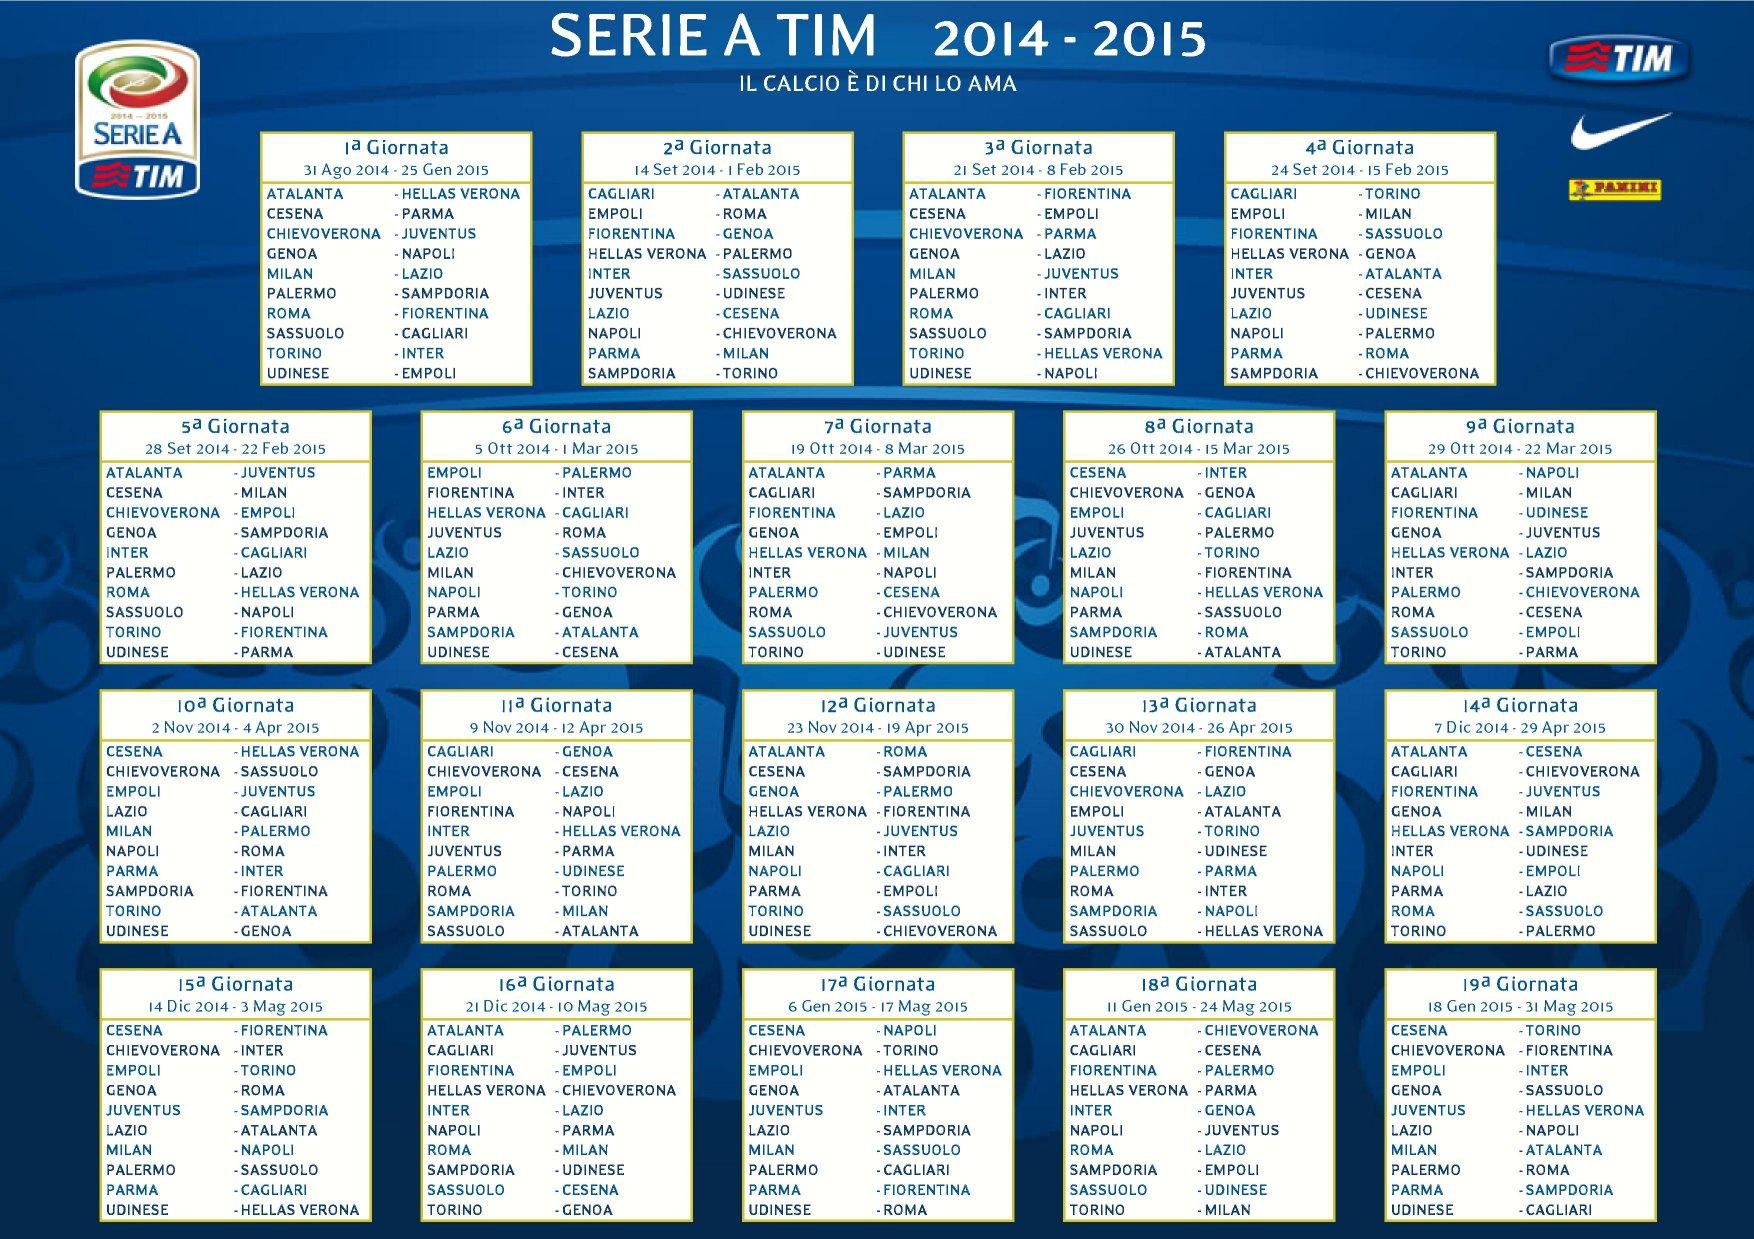 Presentazione Calendario Serie A 2014 2015 Diretta Sky Sport Hd E Sky It Skyseriea Digital News